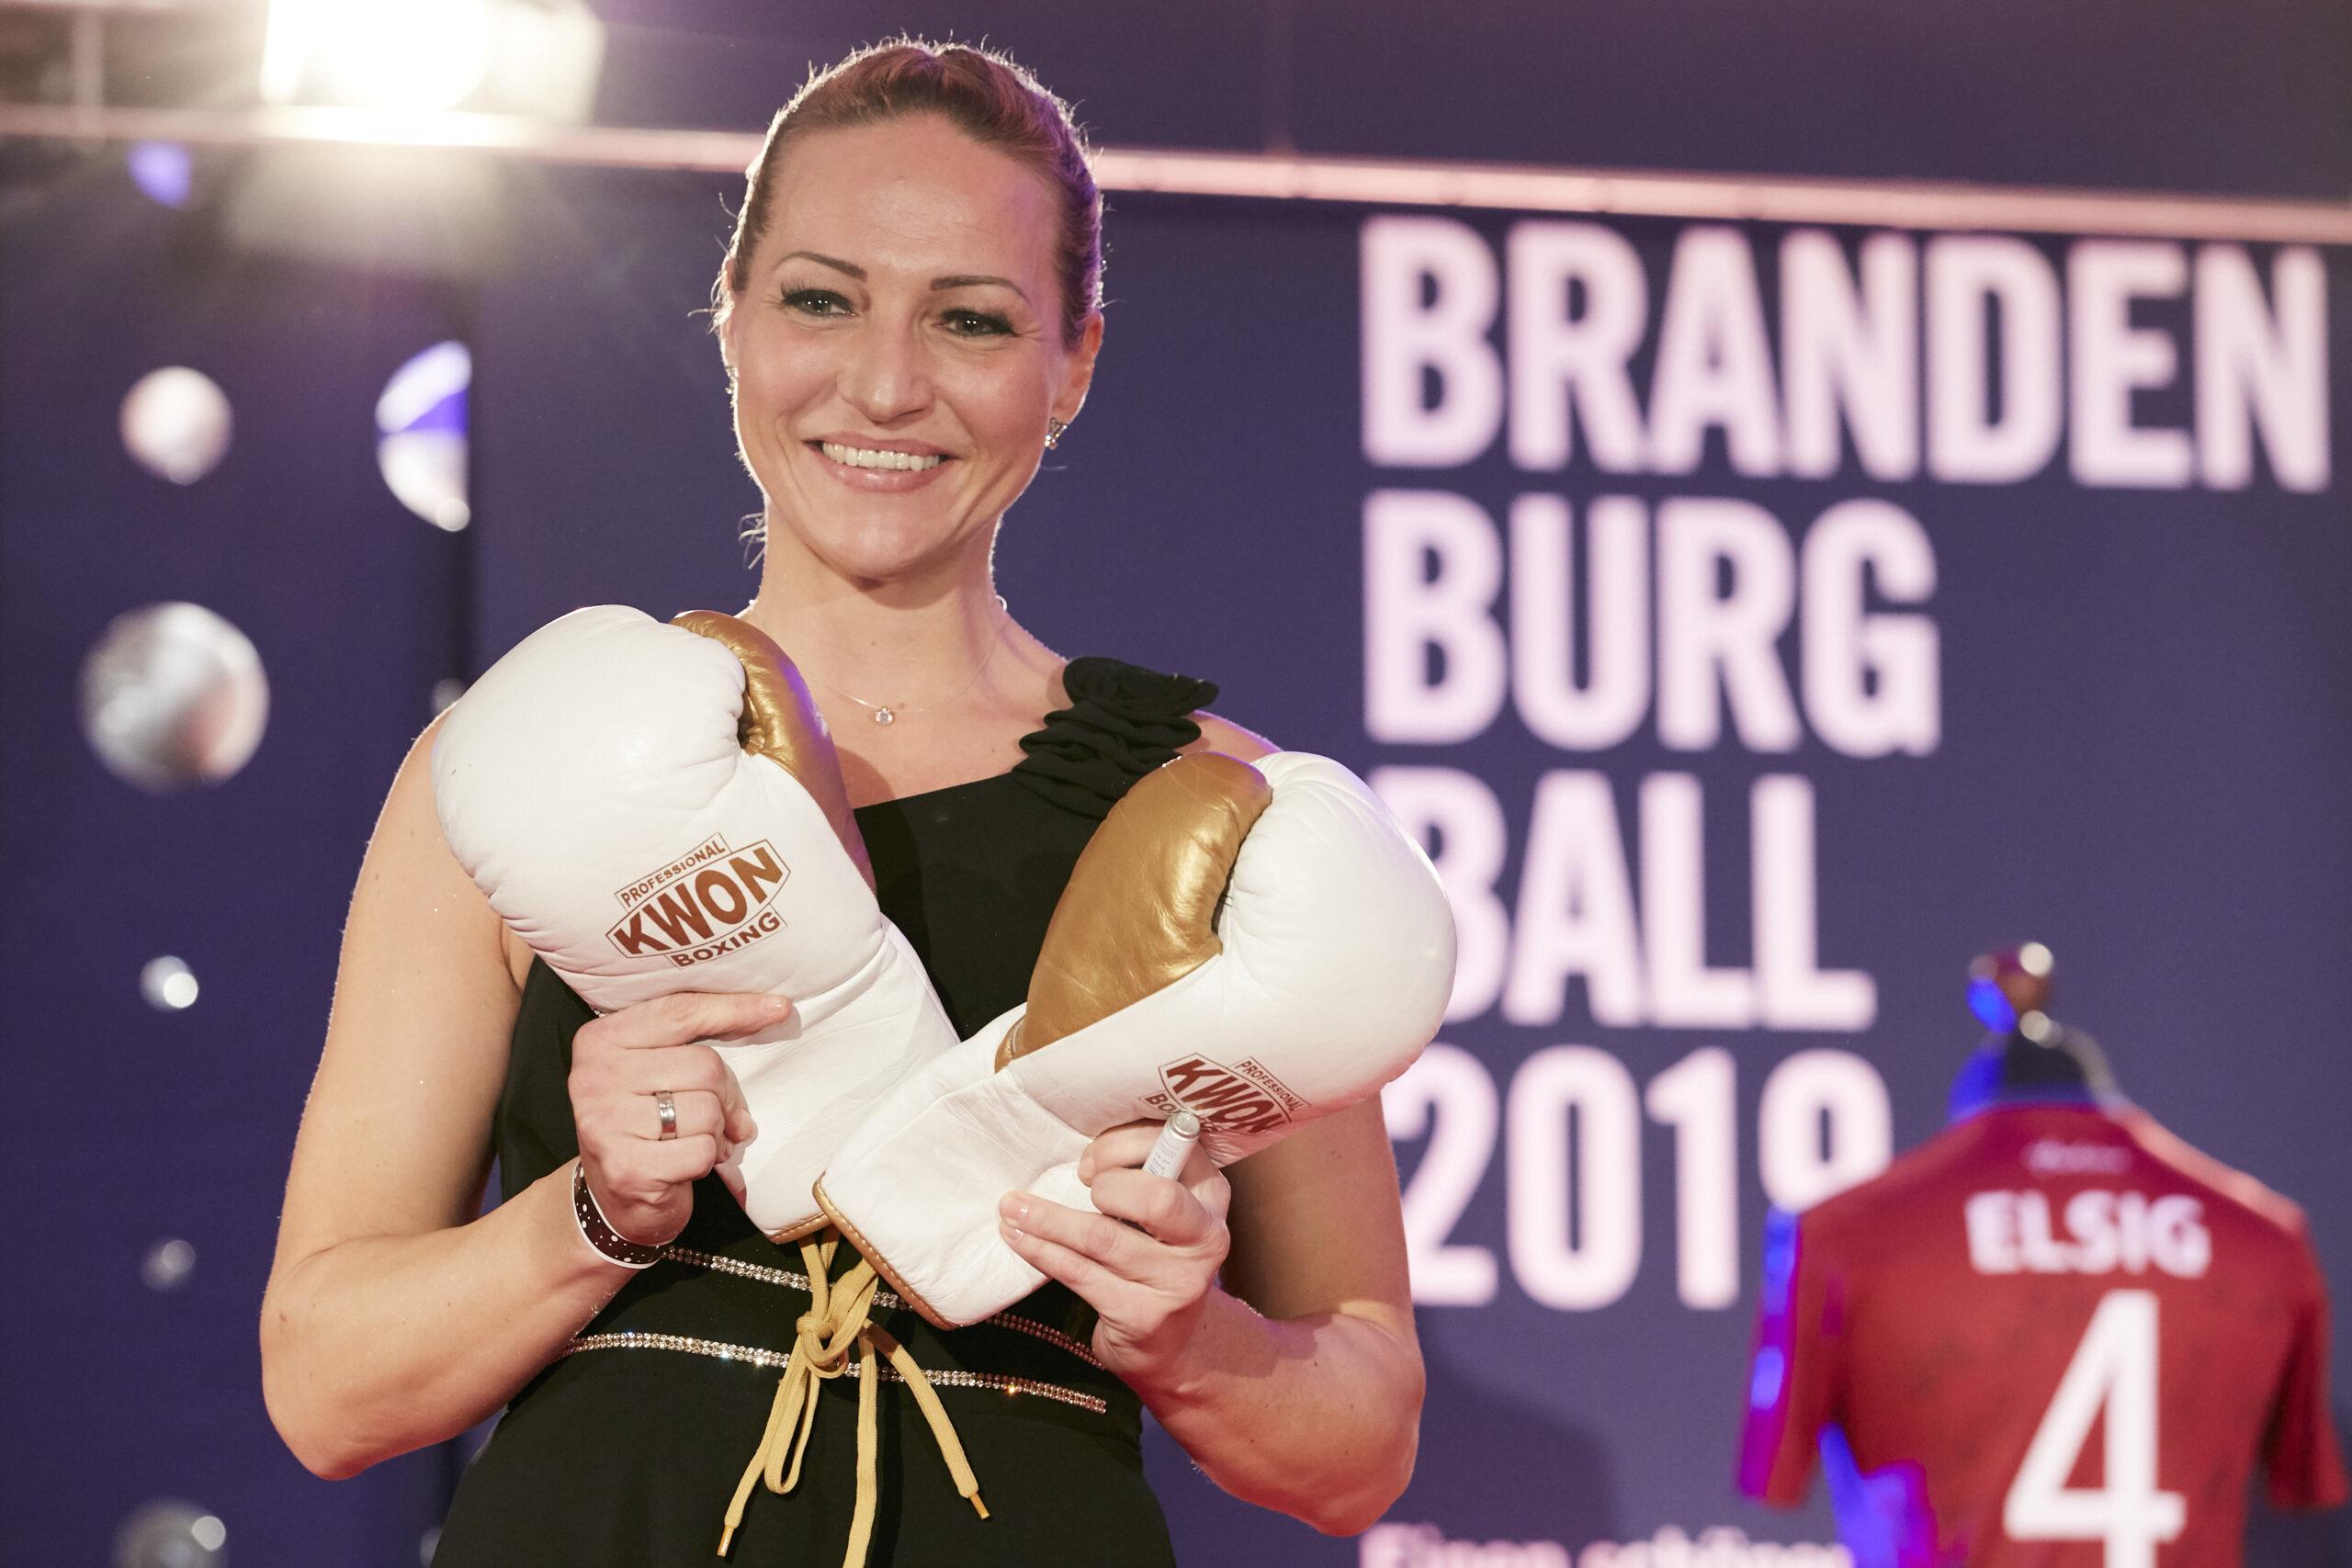 Brandenburgball 2019